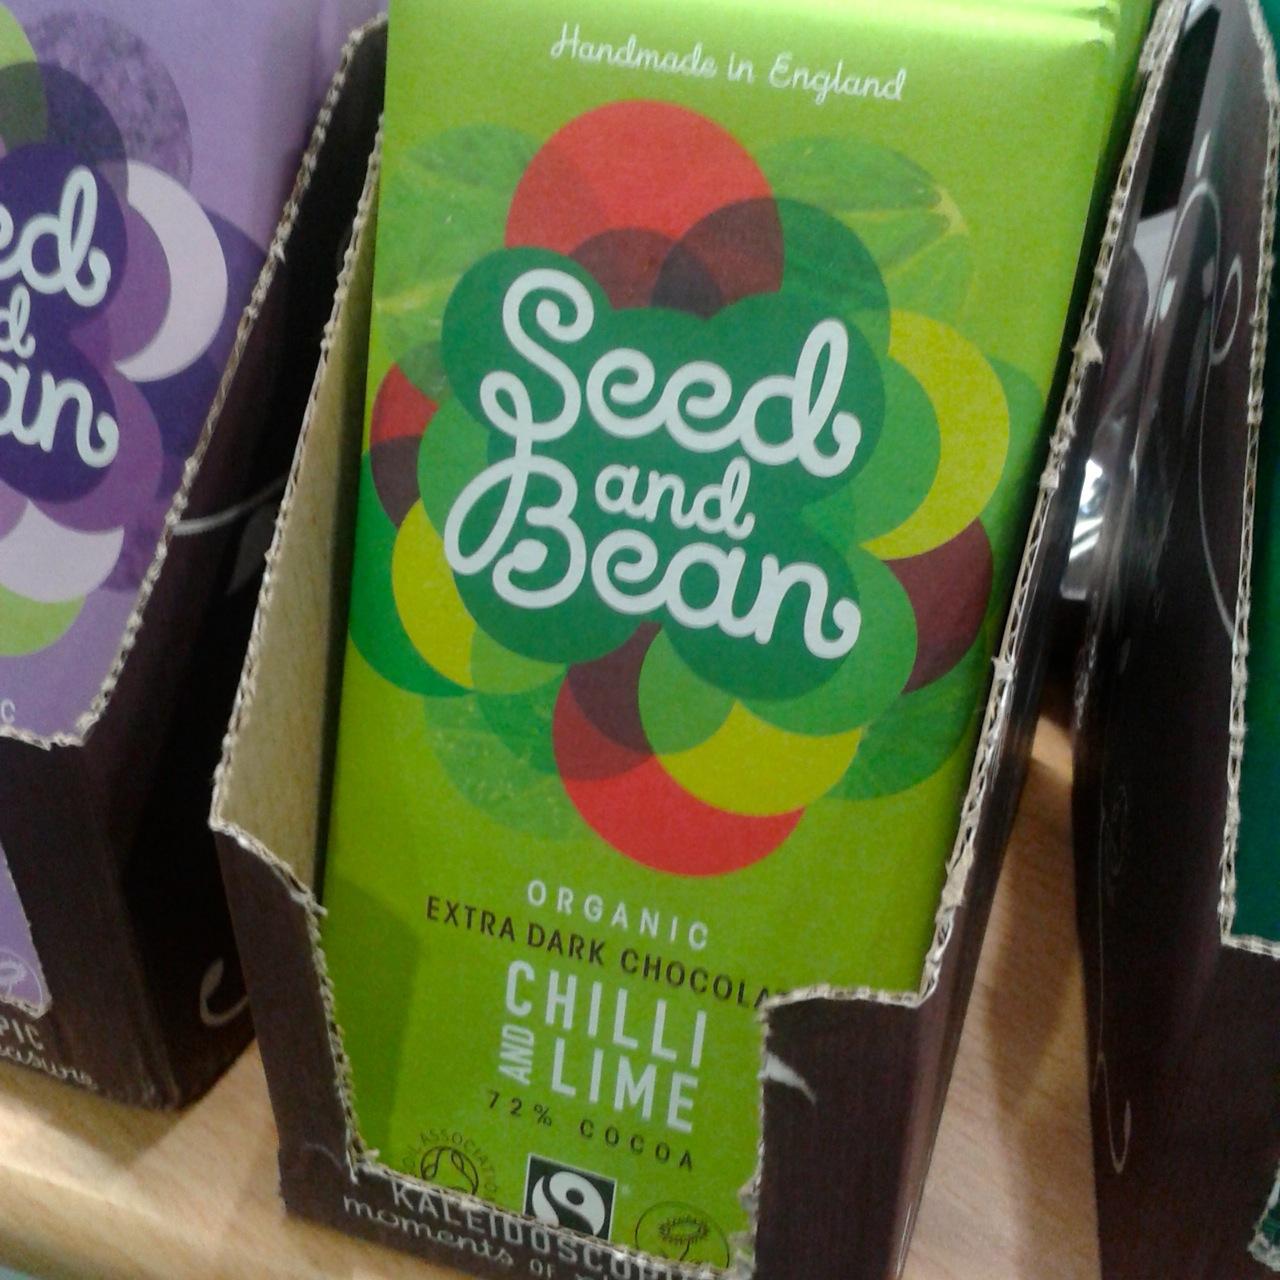 http://i0.wp.com/fatgayvegan.com/wp-content/uploads/2015/04/seed-and-bean.jpg?fit=1280%2C1280